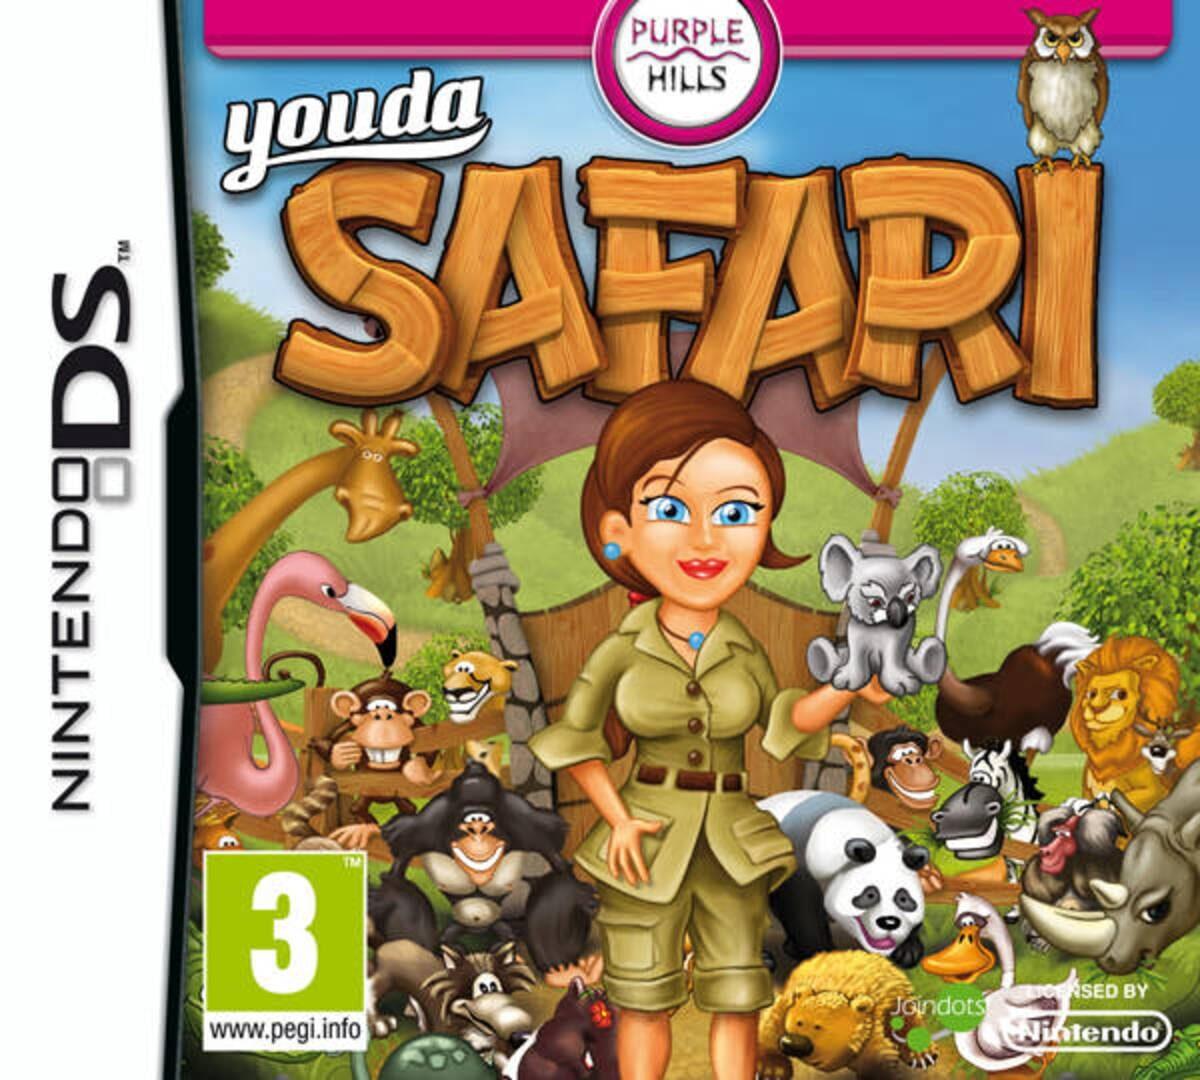 buy Youda Safari cd key for all platform